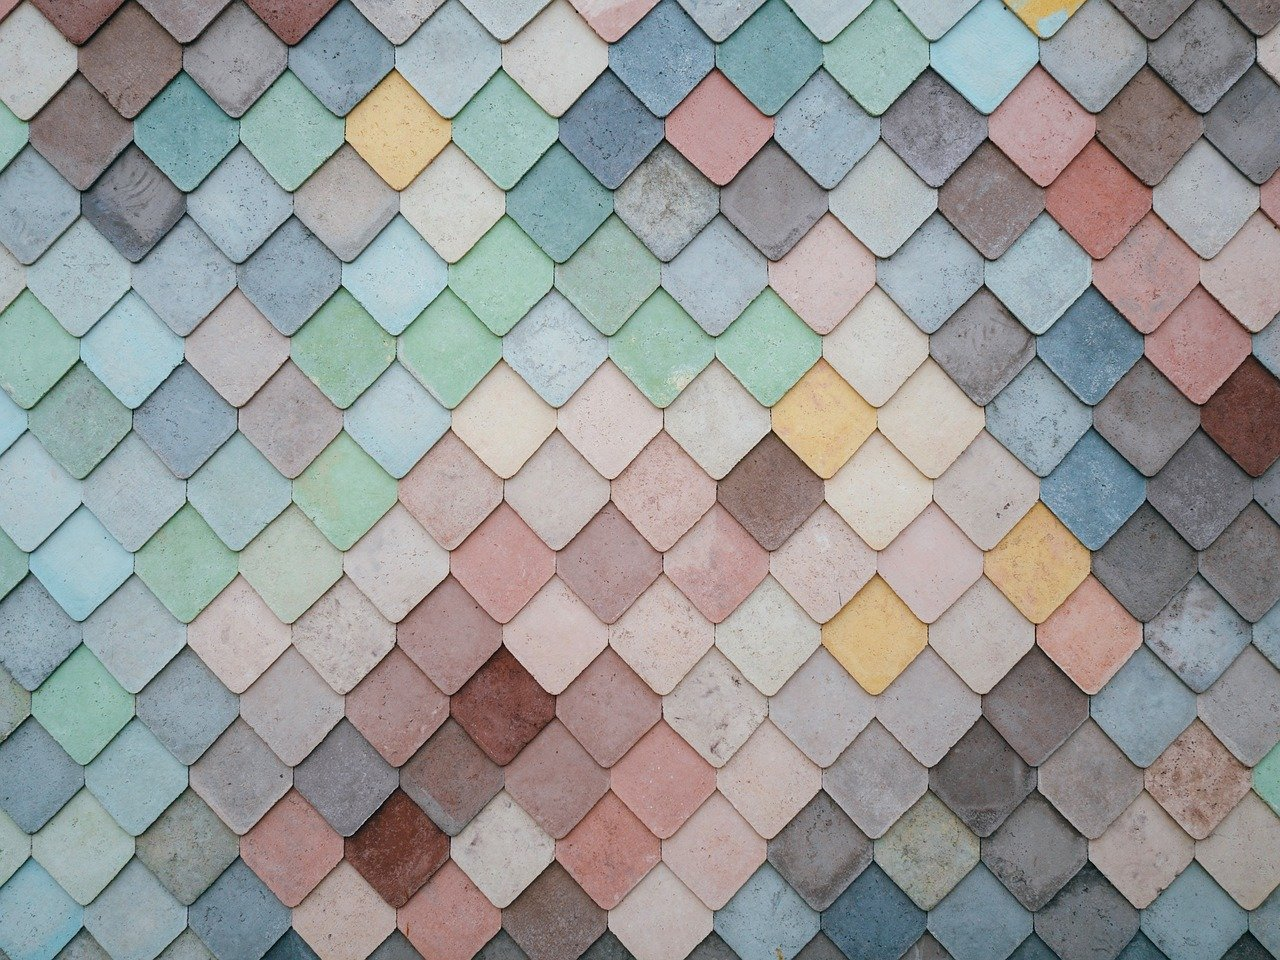 tiles shapes, texture, pattern